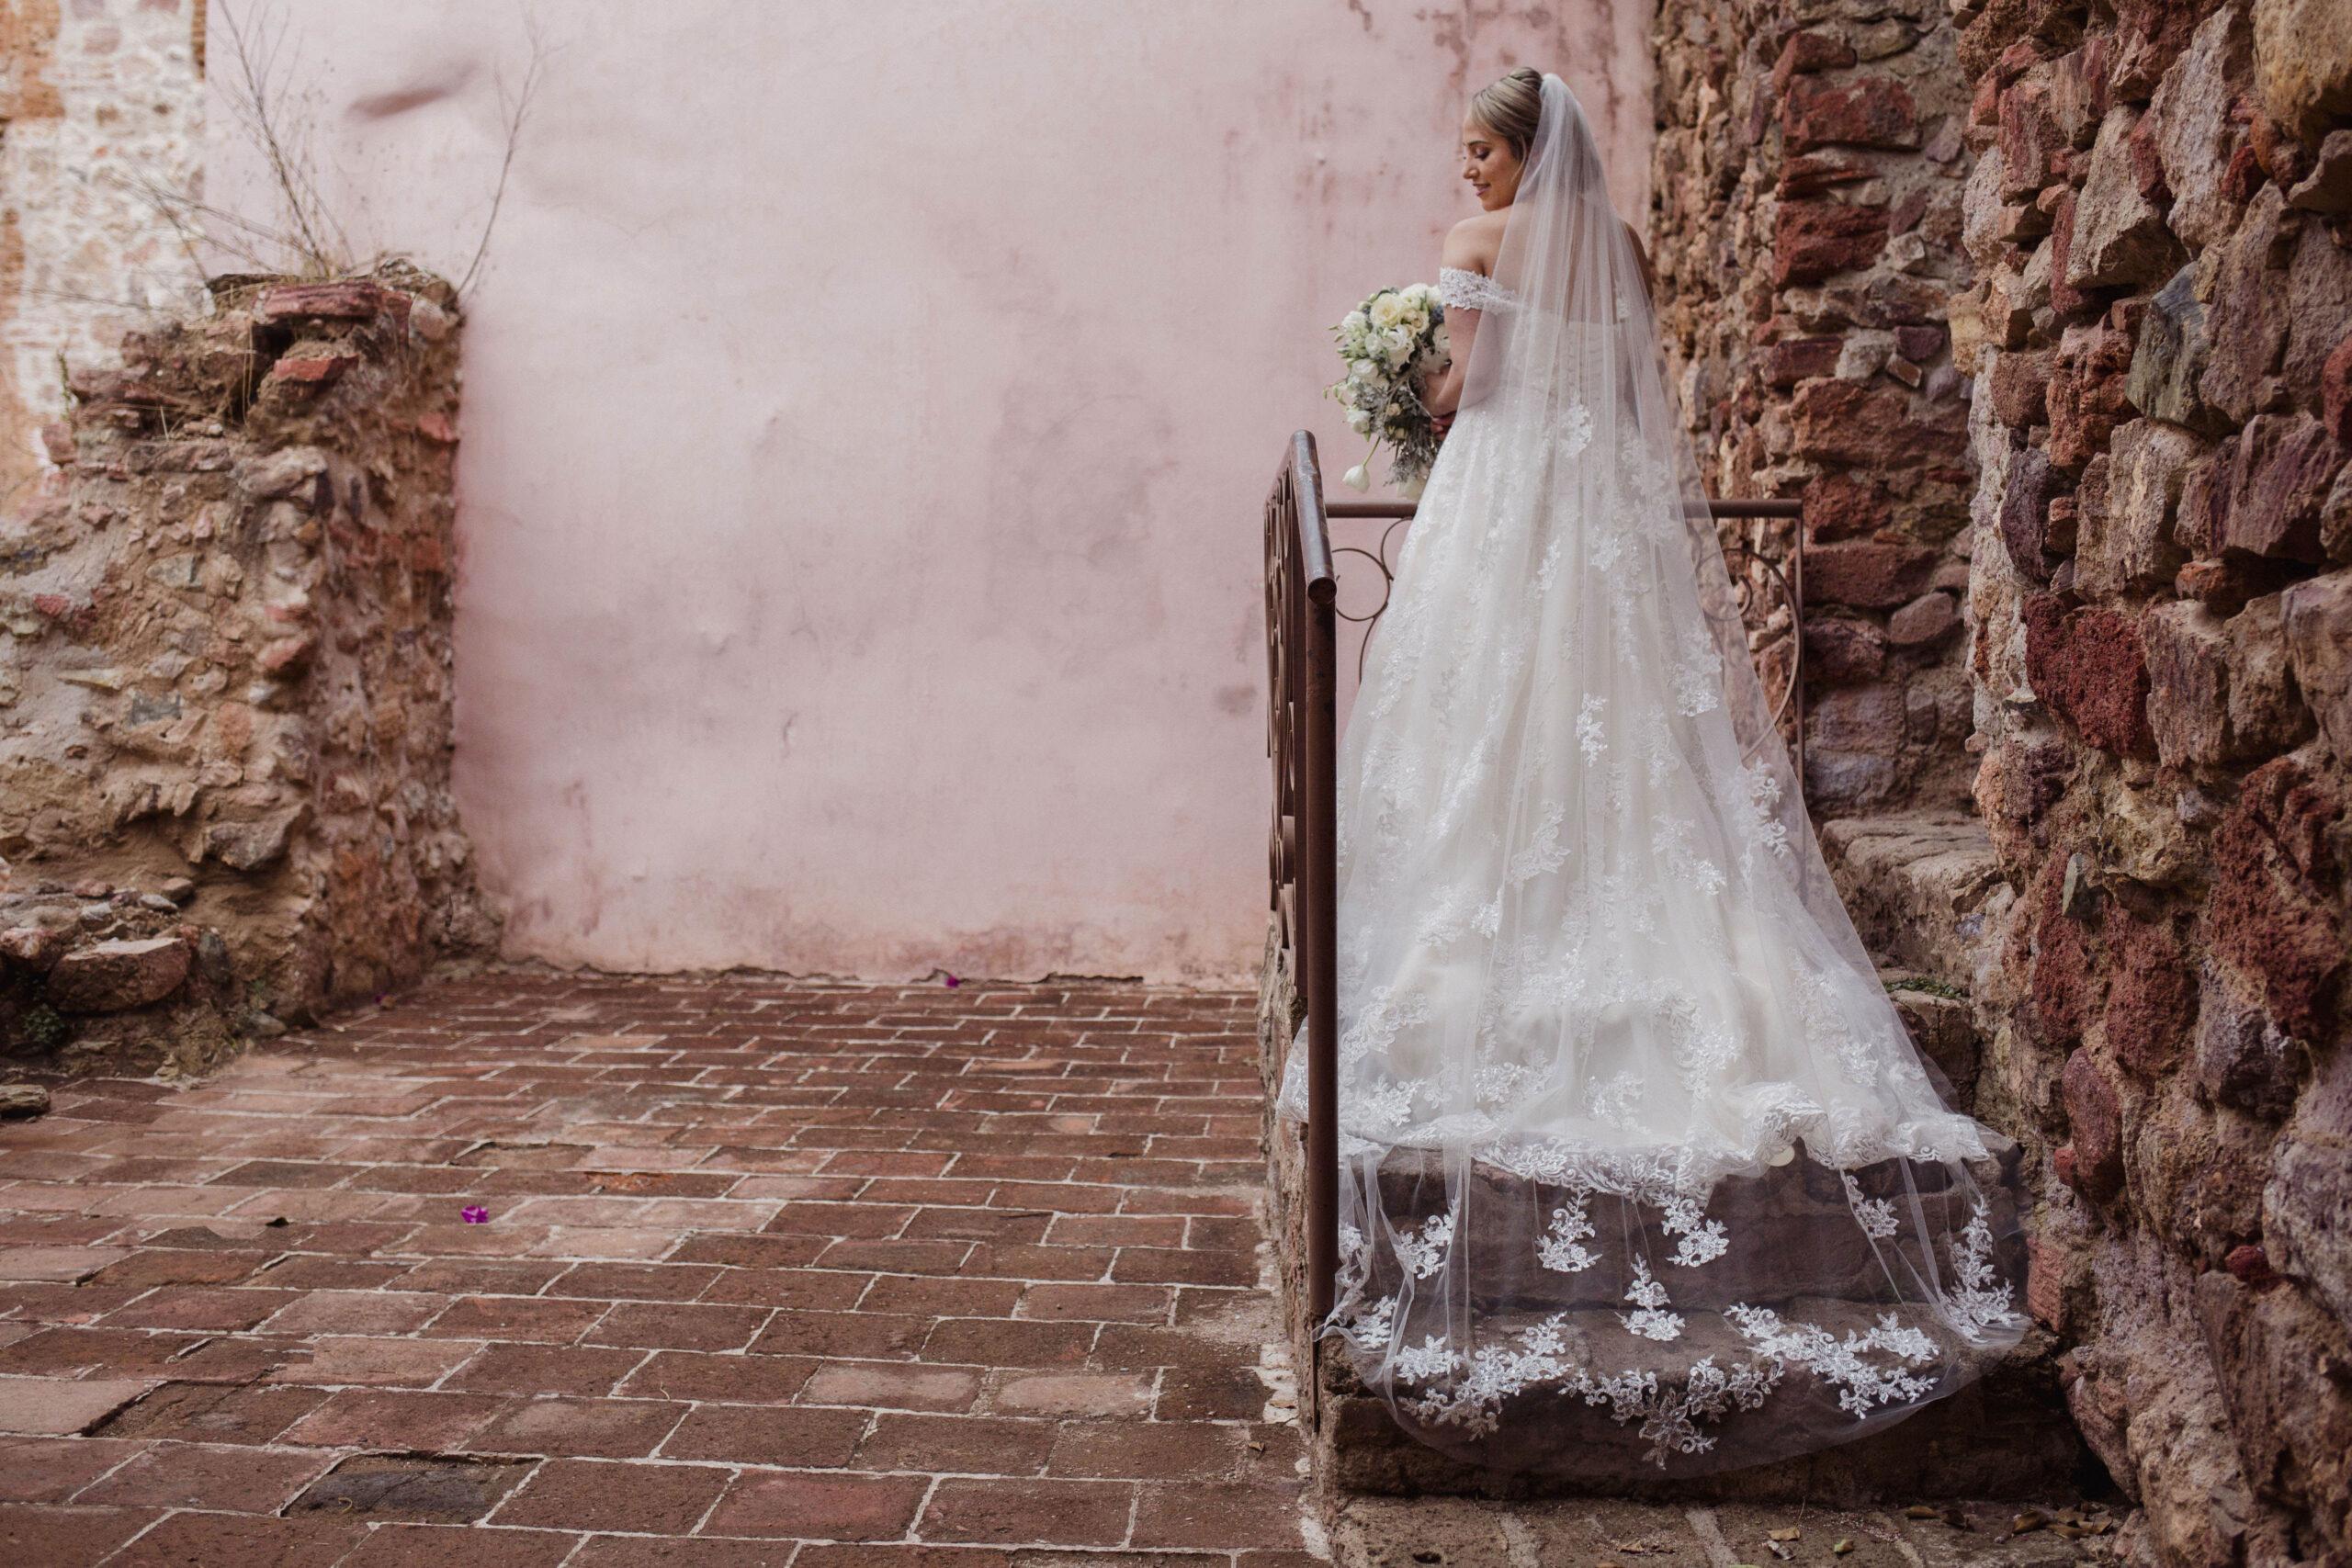 javier_noriega_fotografo_profesional_bodas_zacatecas_mexico_chihuahua_photographer44